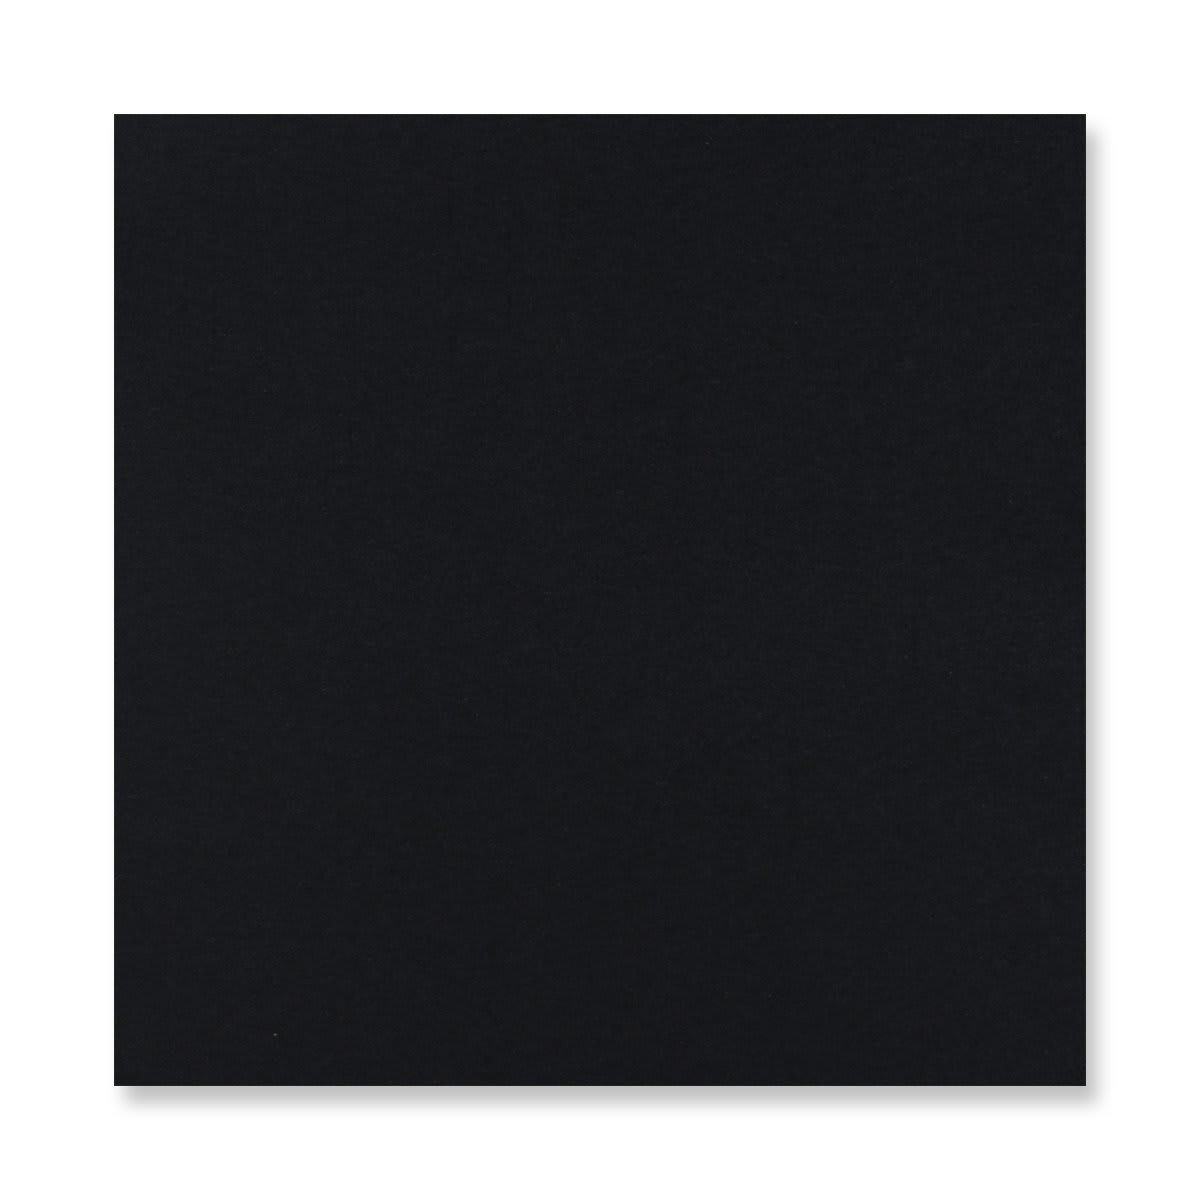 170 x 170MM BLACK V-FLAP PEEL AND SEAL ENVELOPES